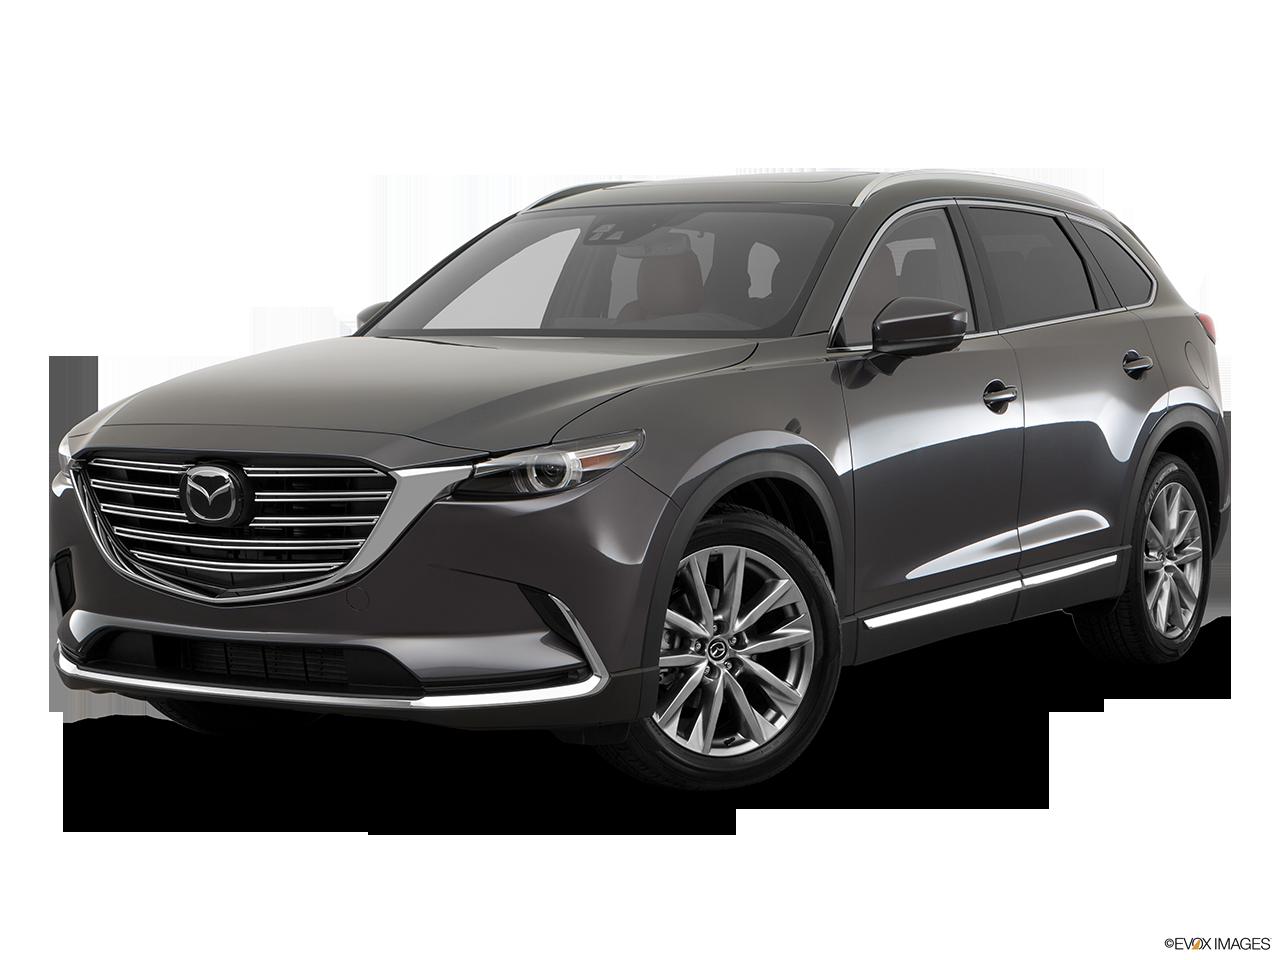 2016 Mazda CX-9 dealer serving Los Angeles | Galpin Mazda